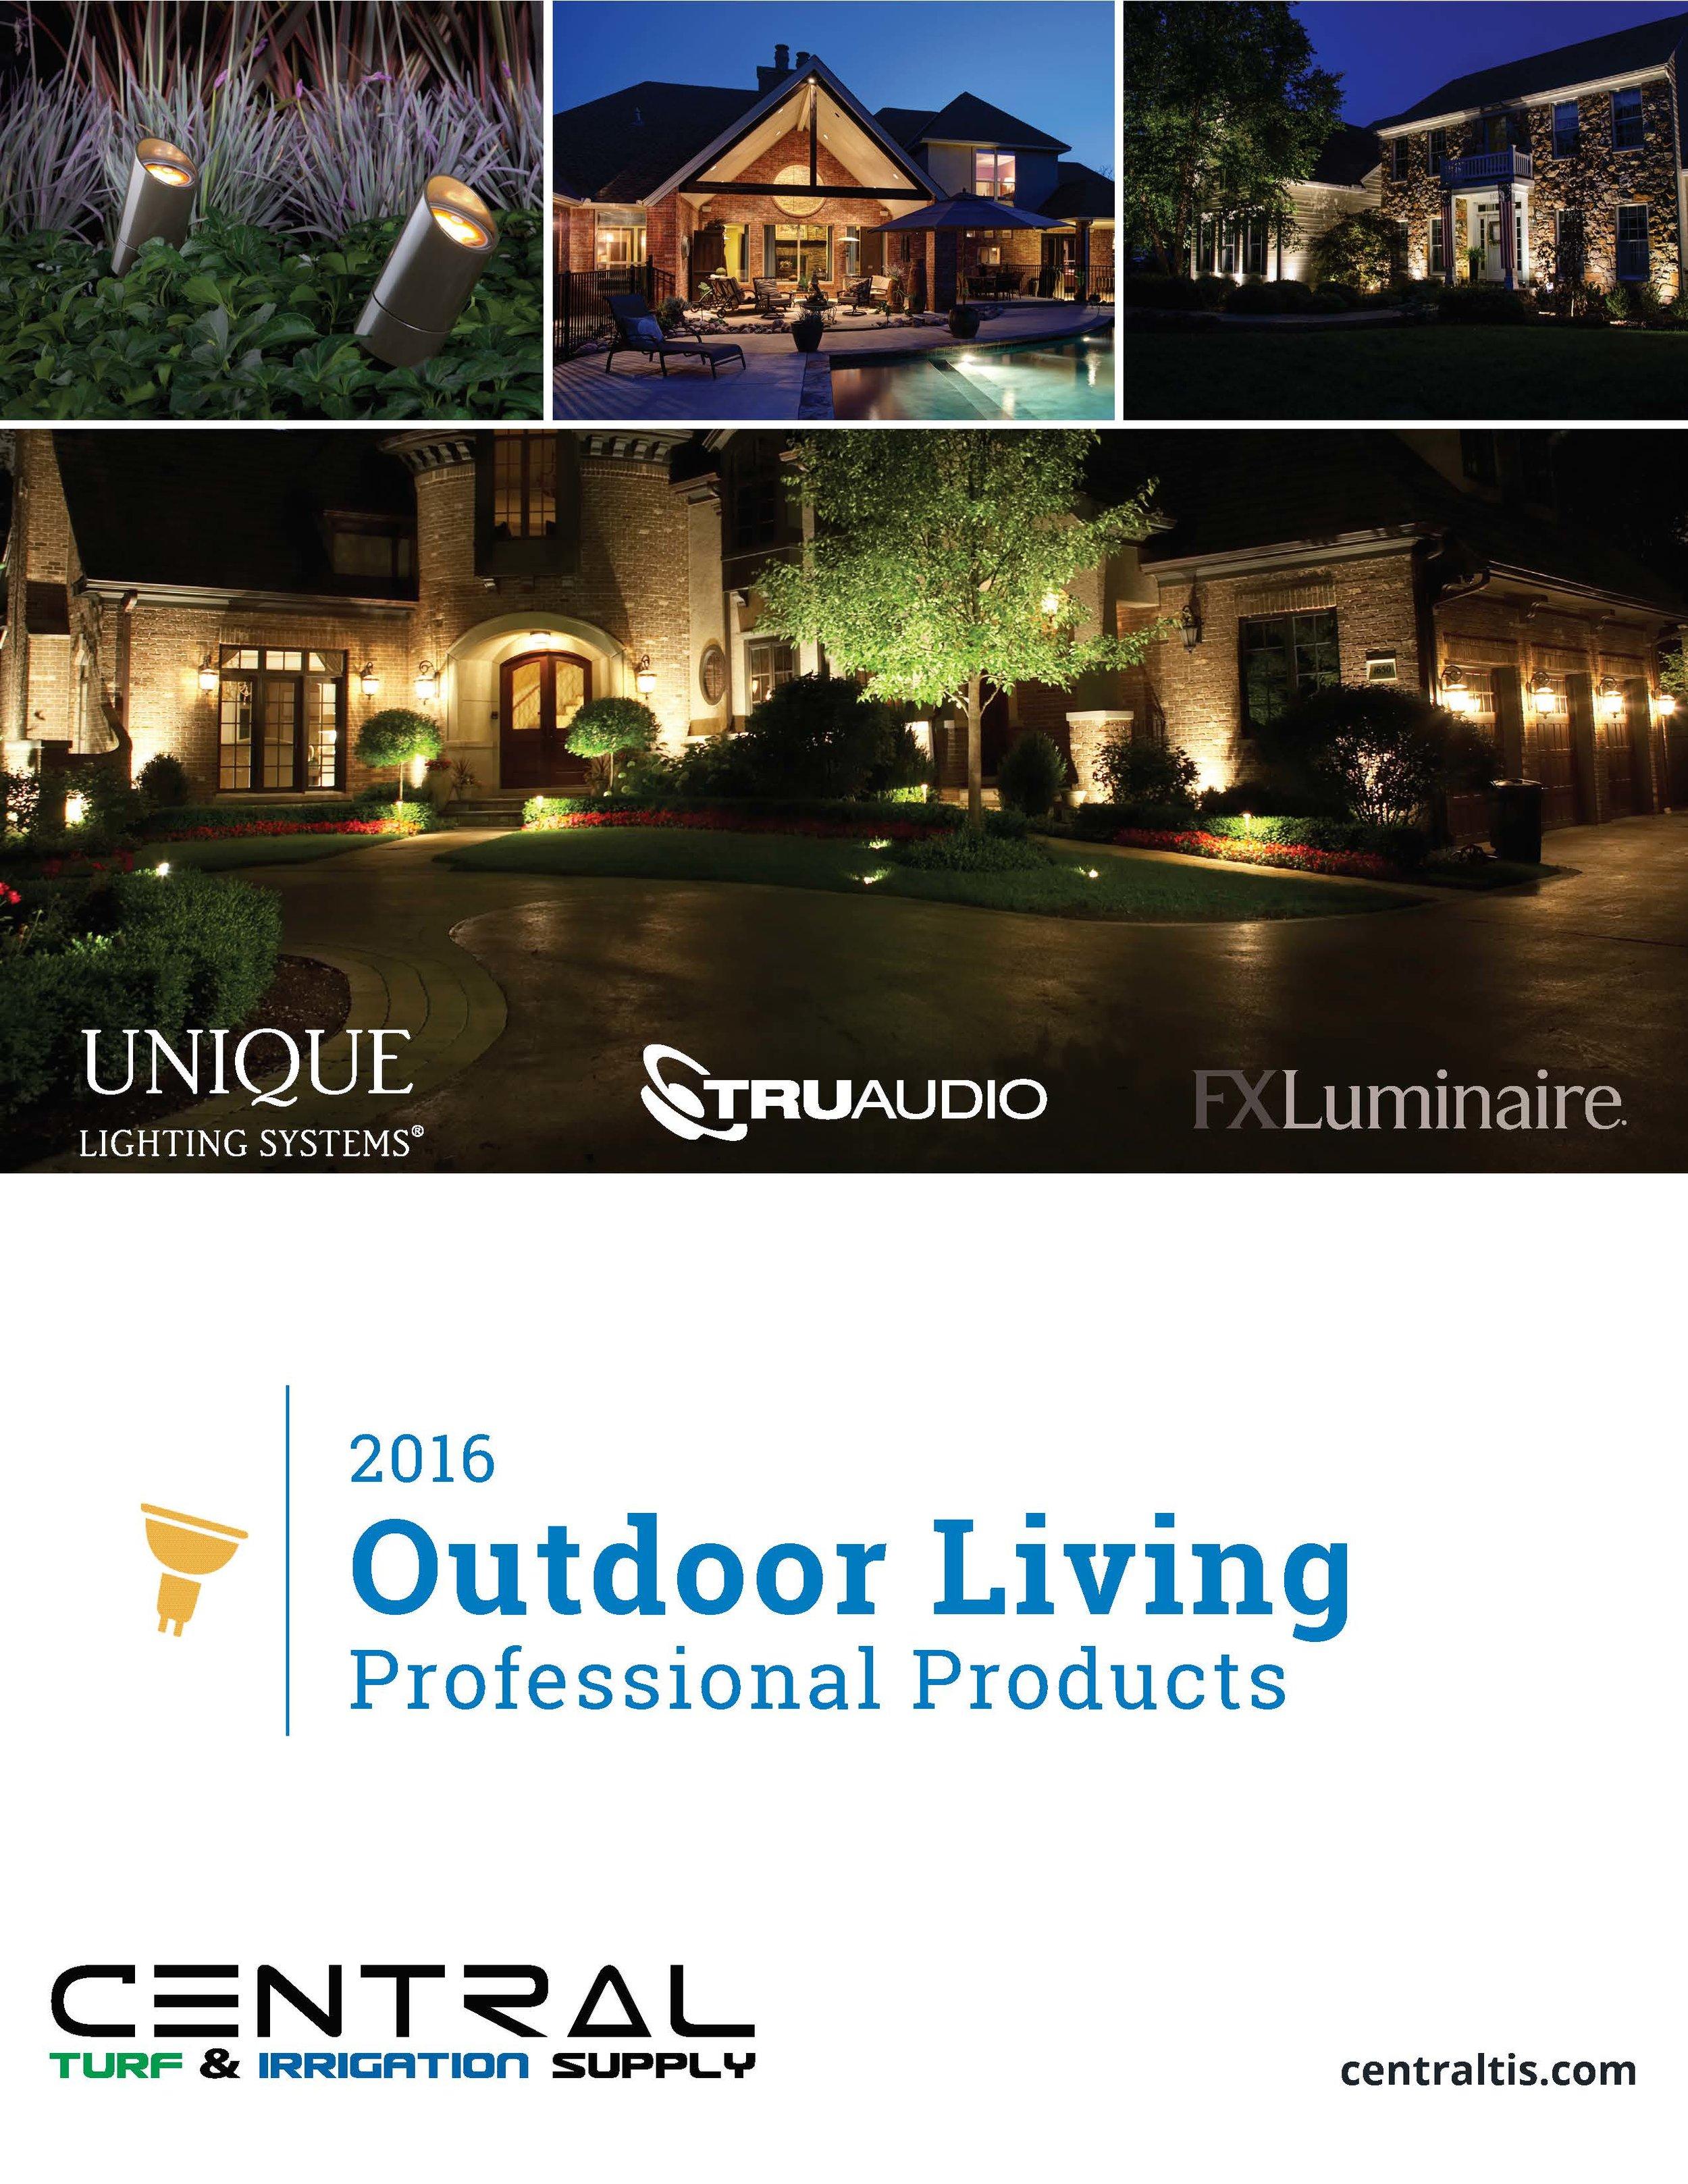 2016 Outdoor Living Brochure_Page_1.jpg